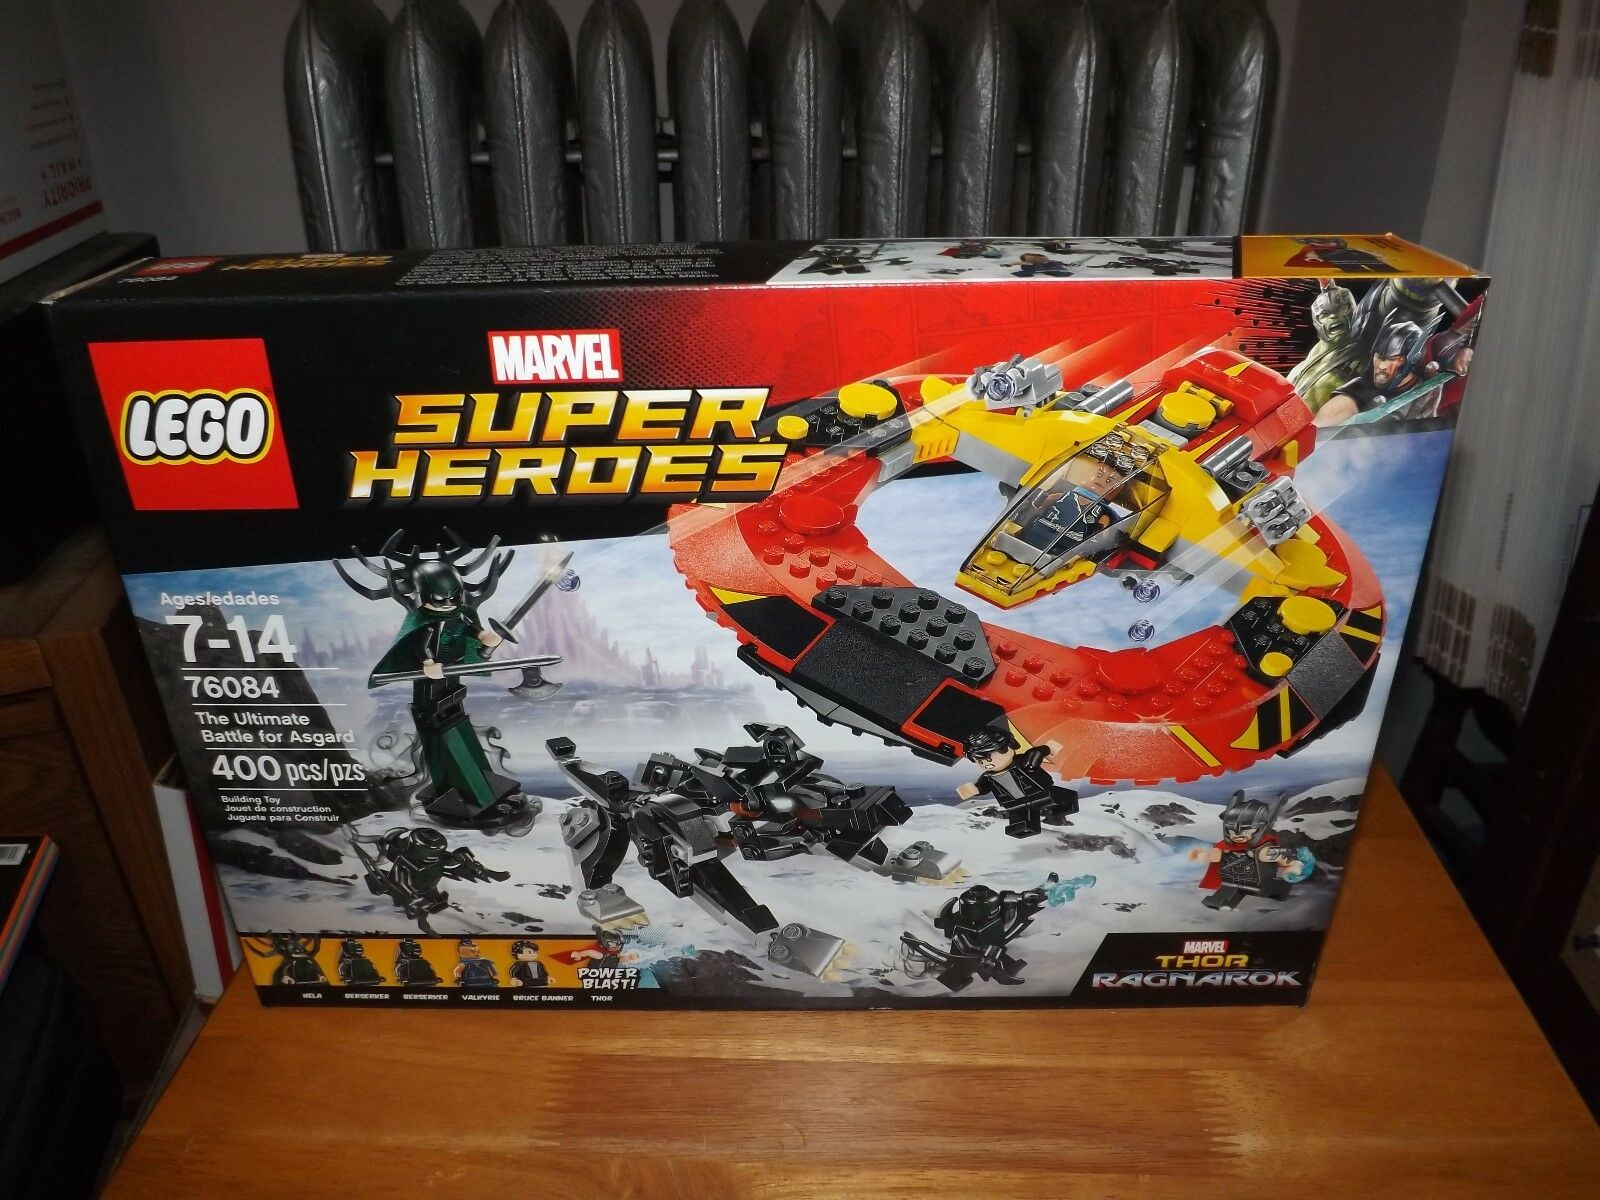 LEGO, THOR RAGNAROK, THE ULTIMATE BATTLE FOR ASGARD, KIT  76084, NEW IN BOX 2017